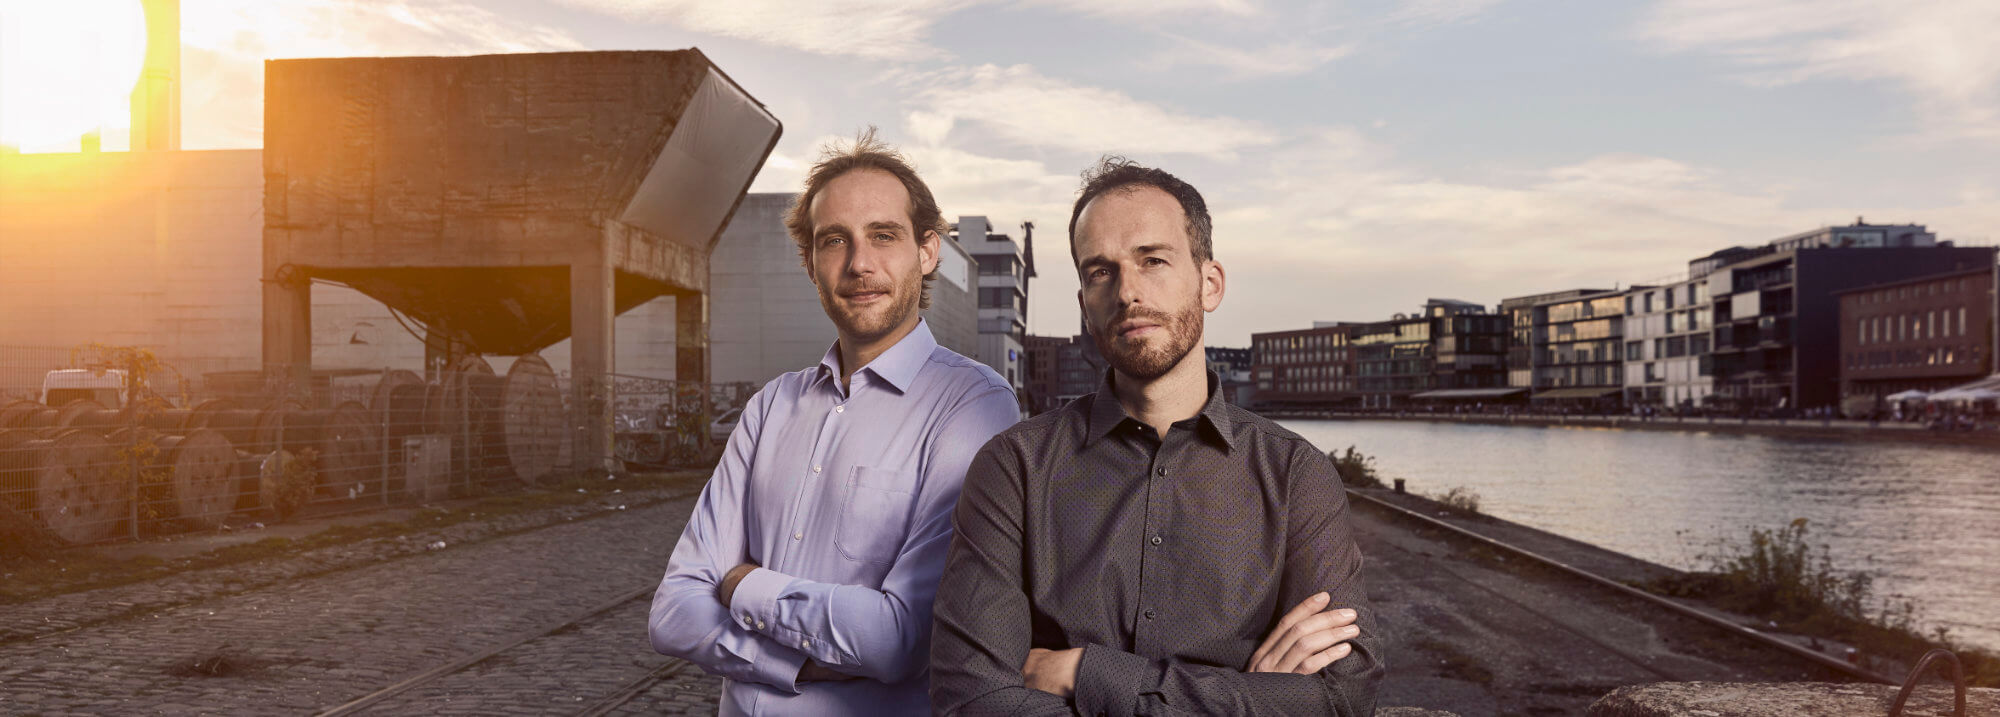 KulturKonzepte - Team